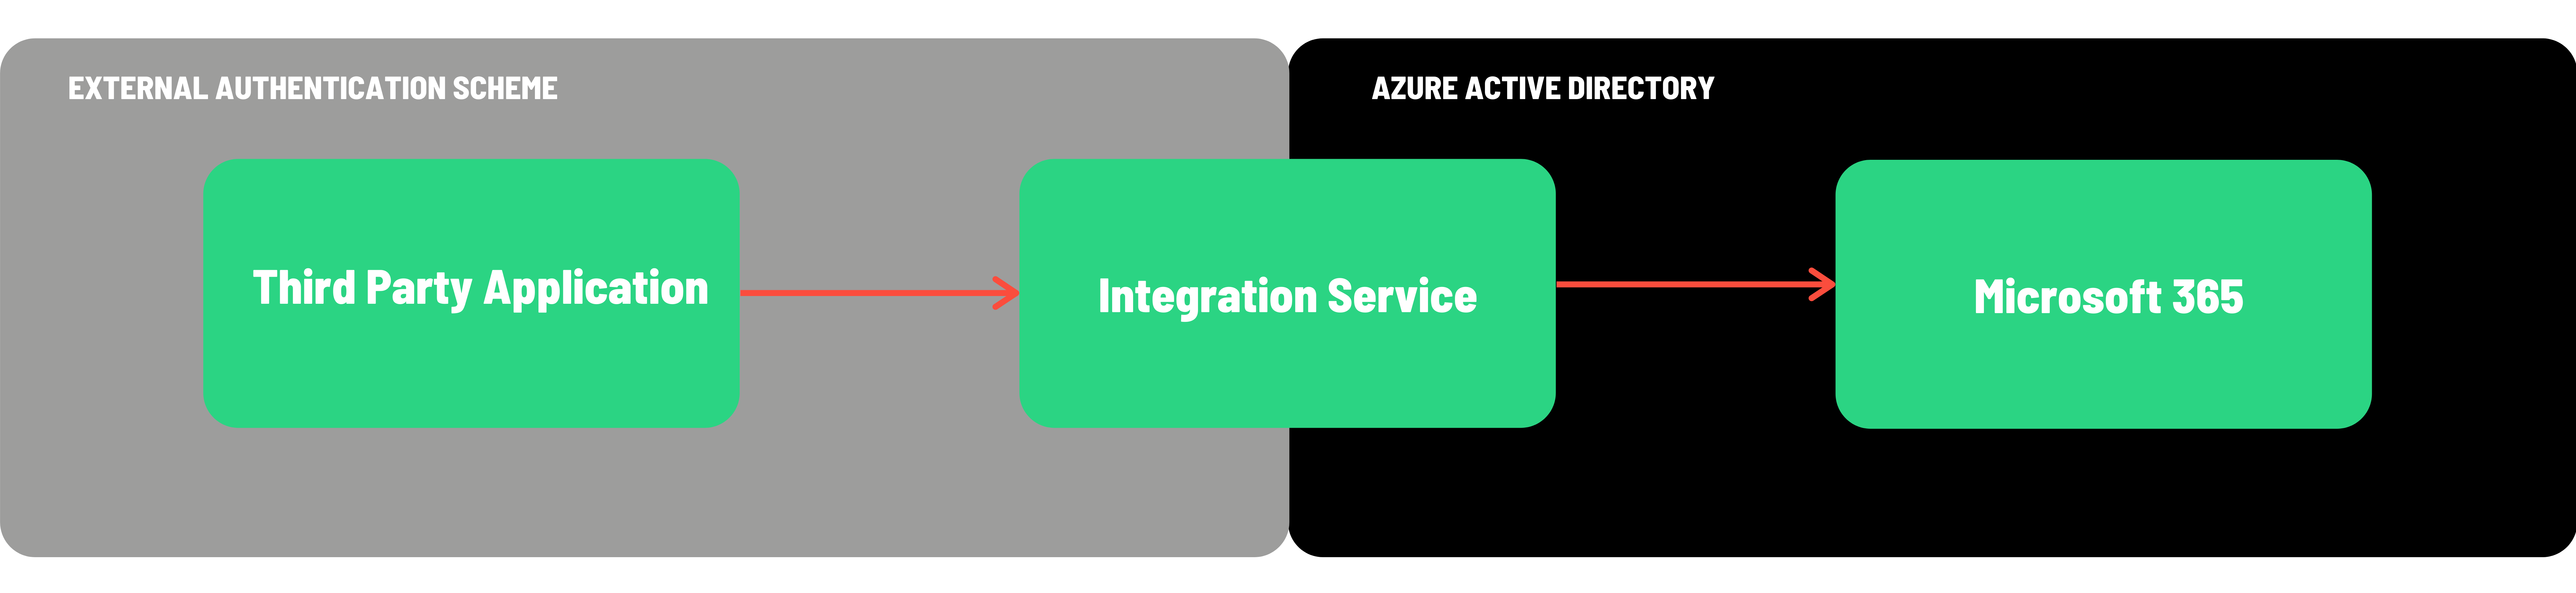 External Authentication Scheme and Azure Active Directory graph